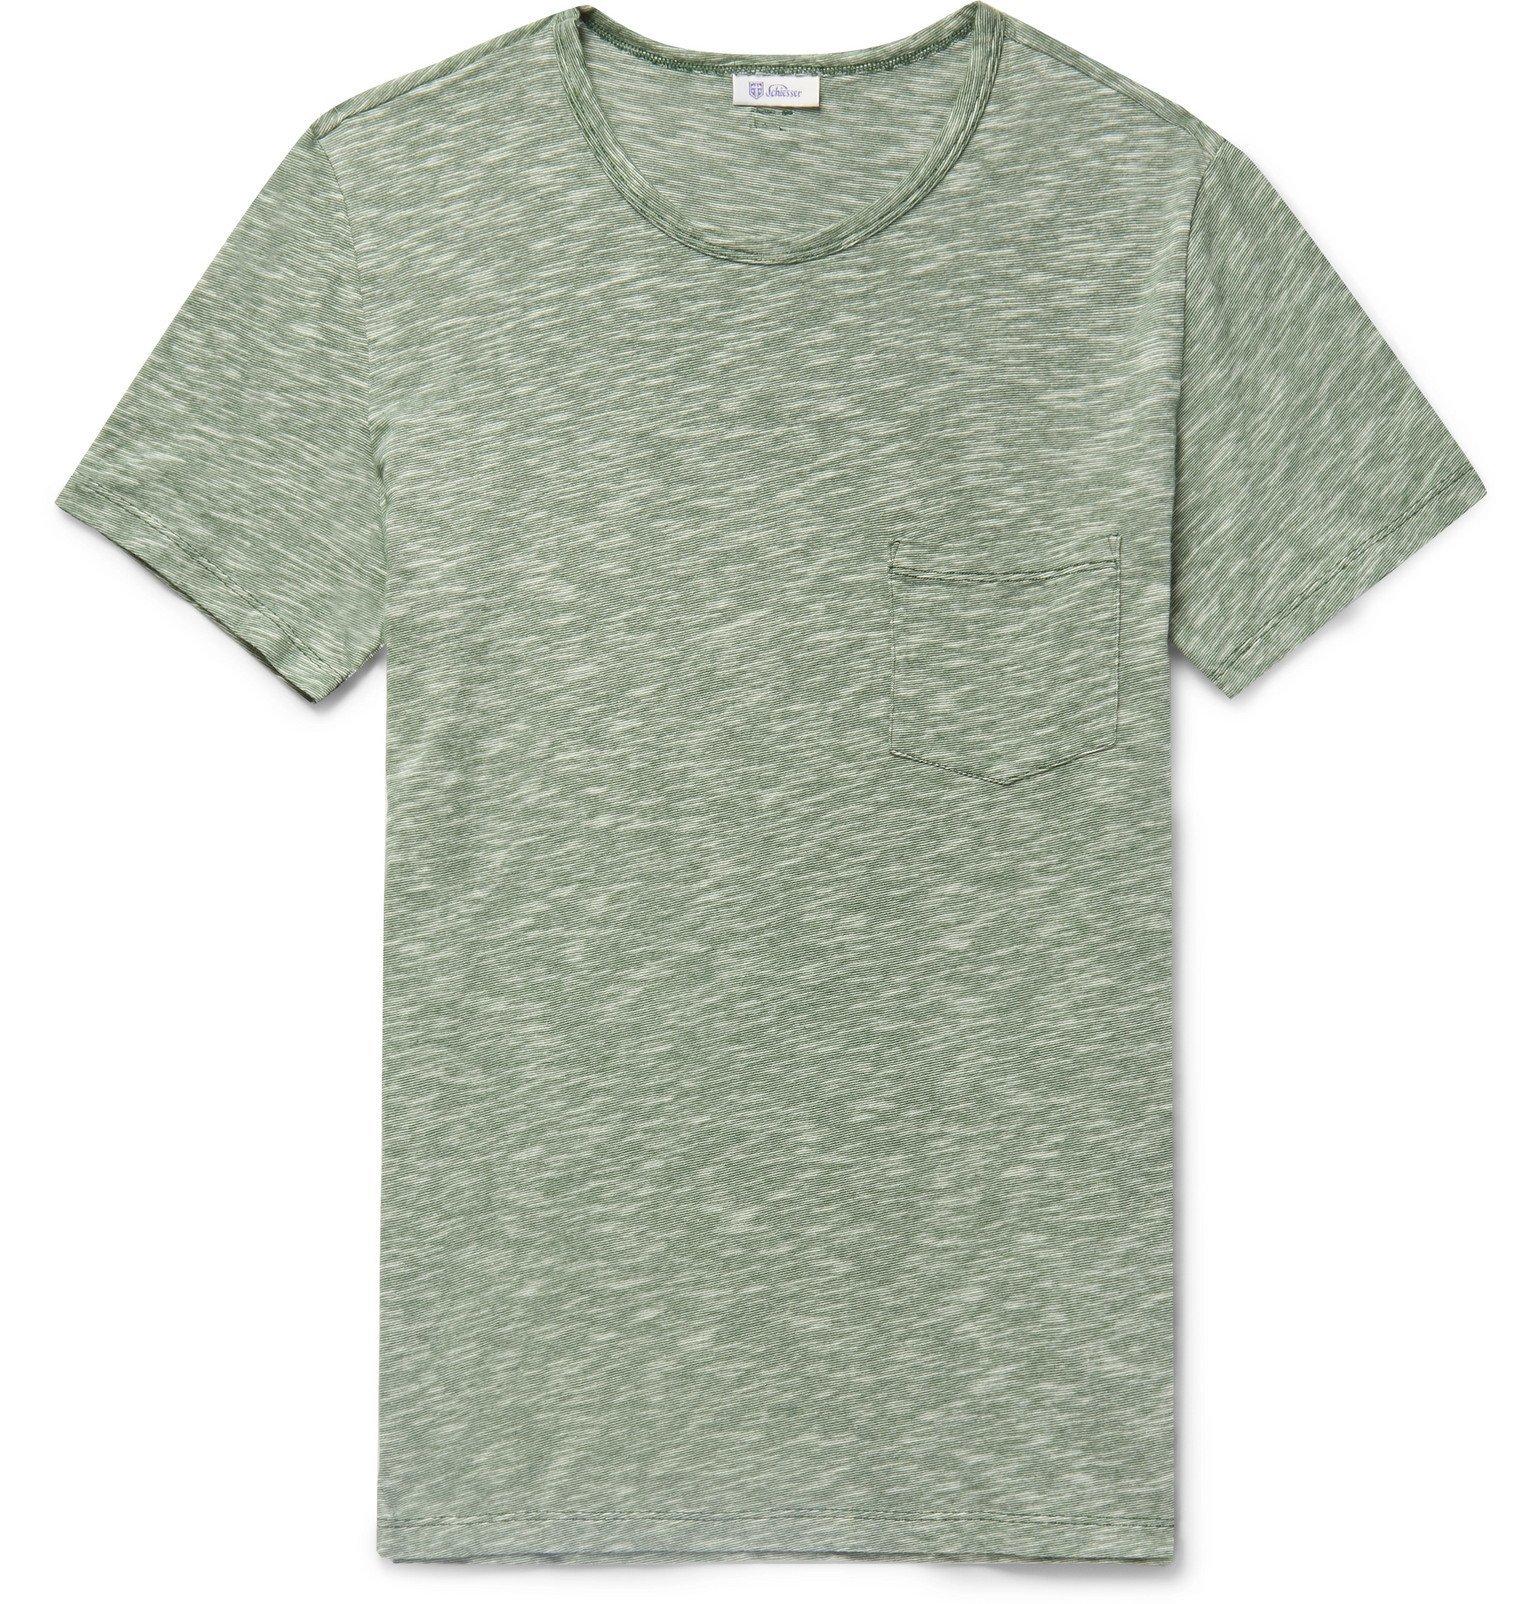 Schiesser - Rudolf Mélange Cotton T-Shirt - Green